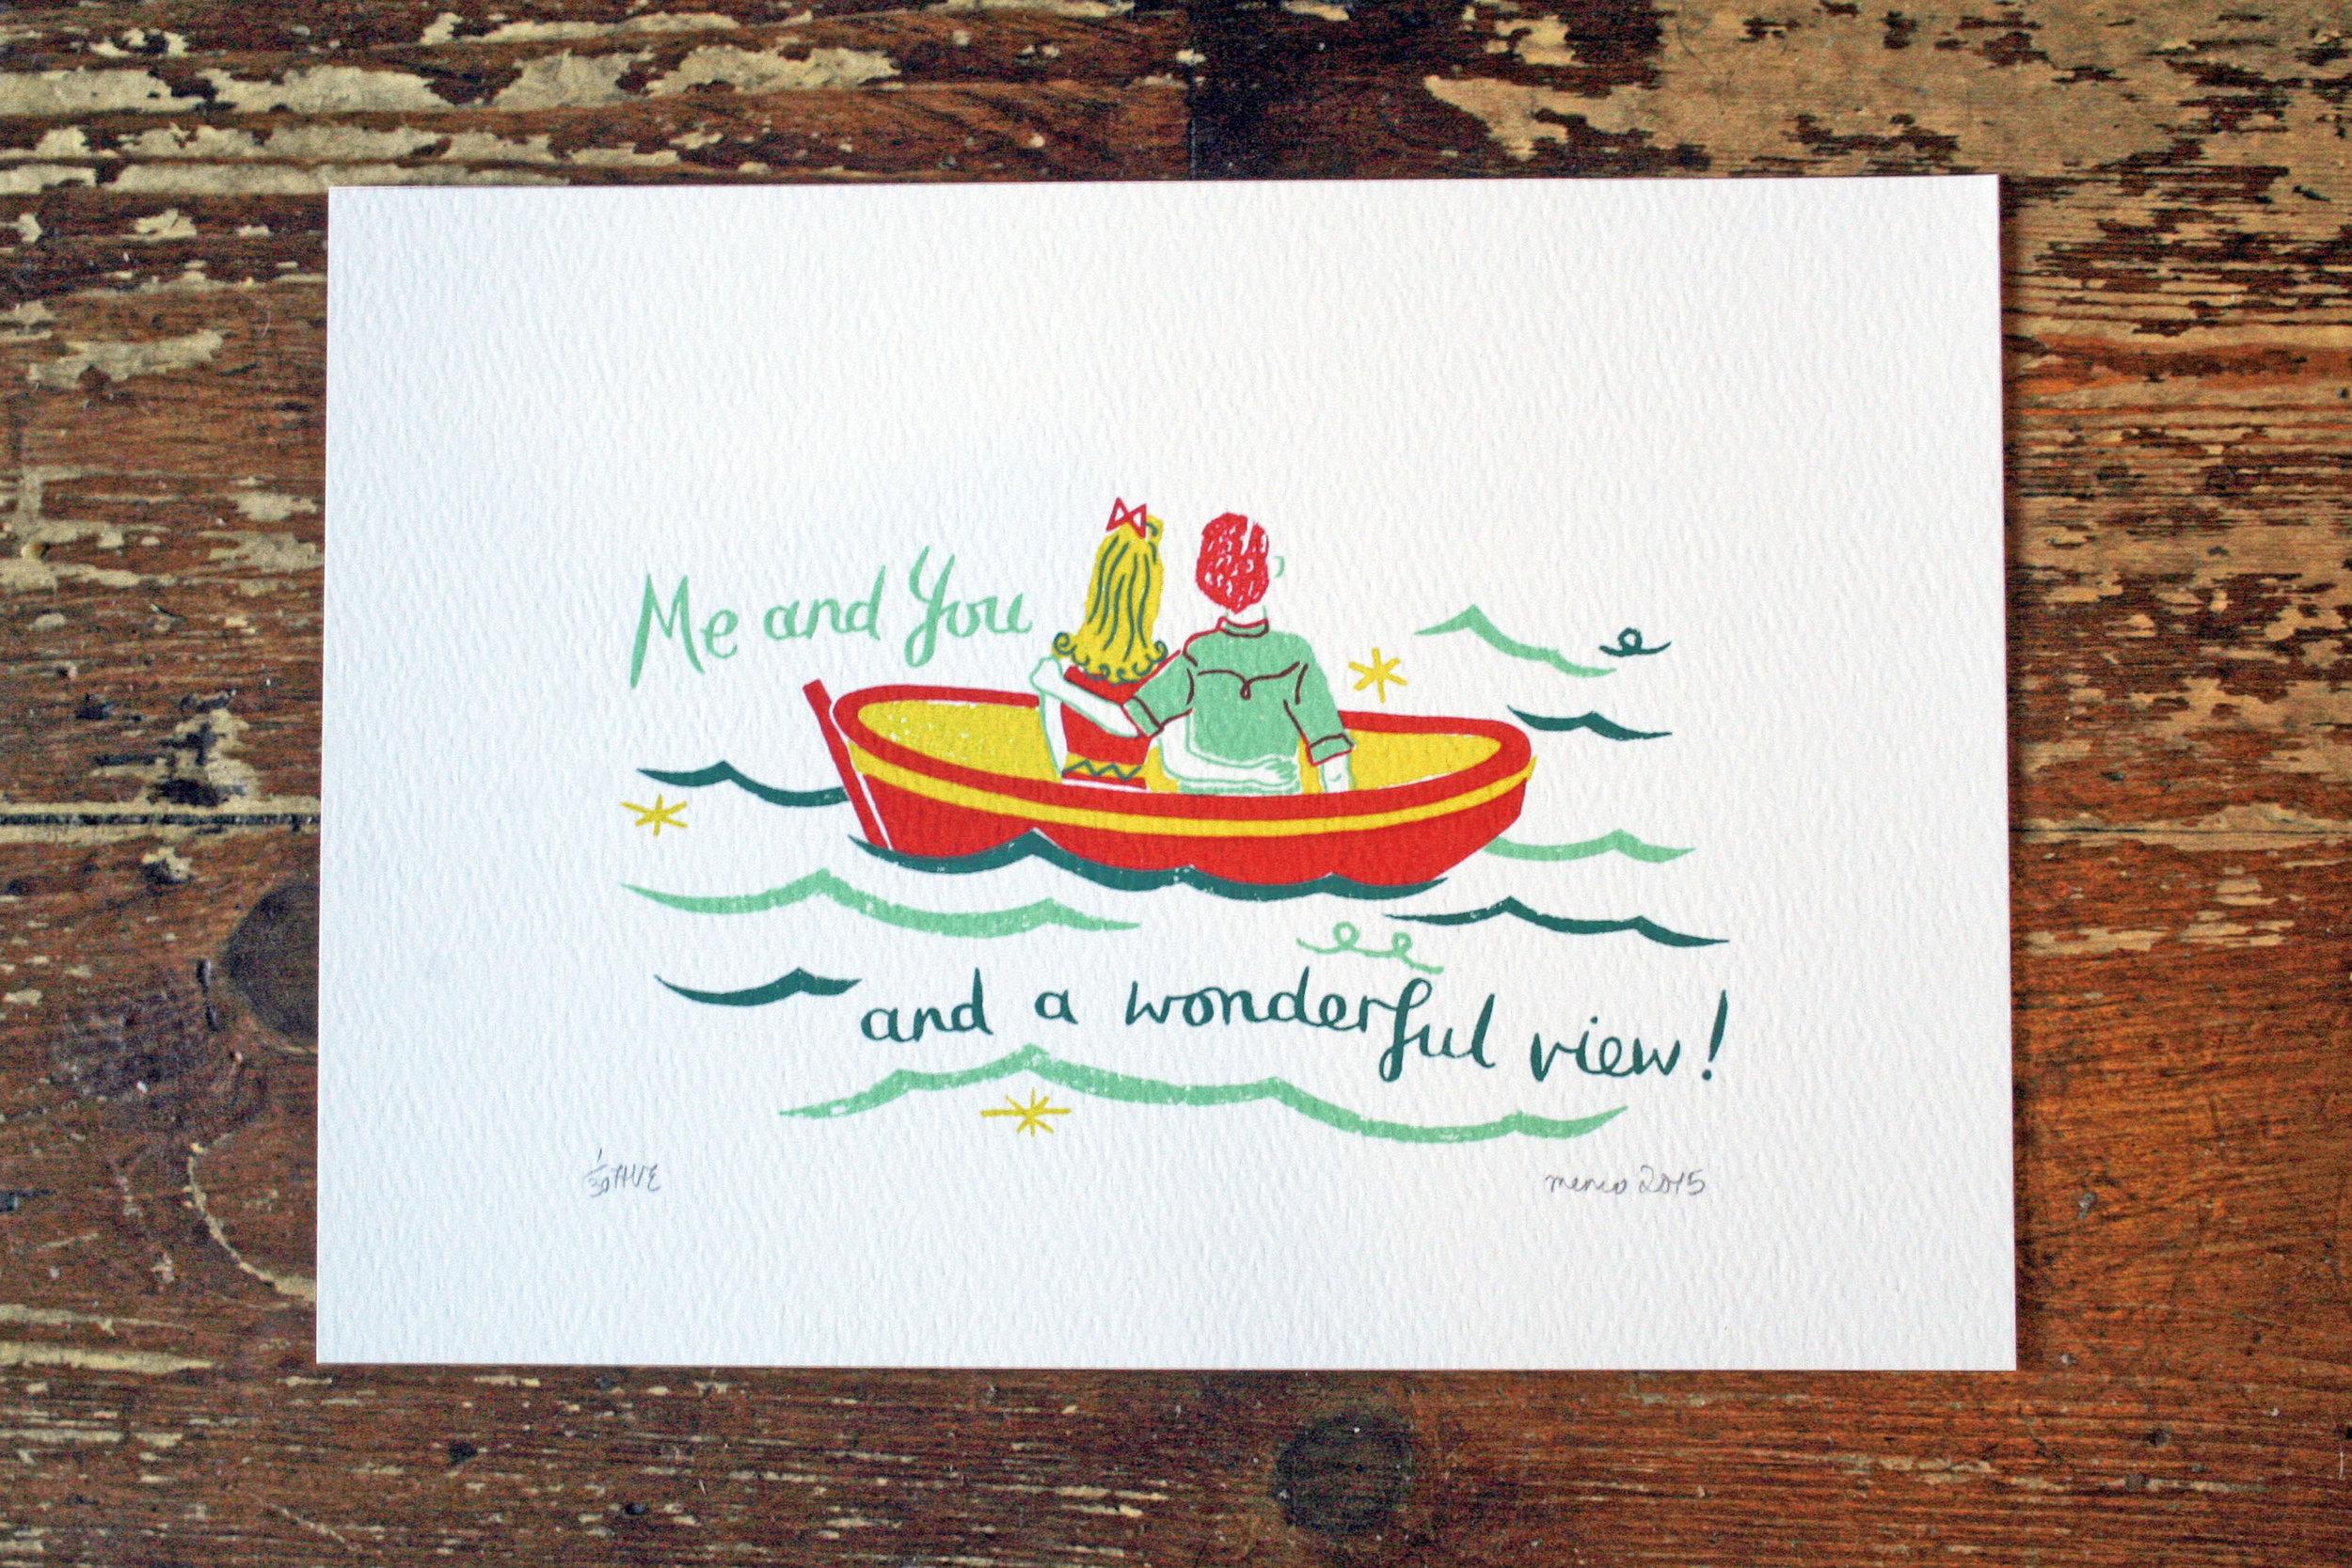 Wonderful View  screenprint  14 x 9 cm  £25 (unframed)